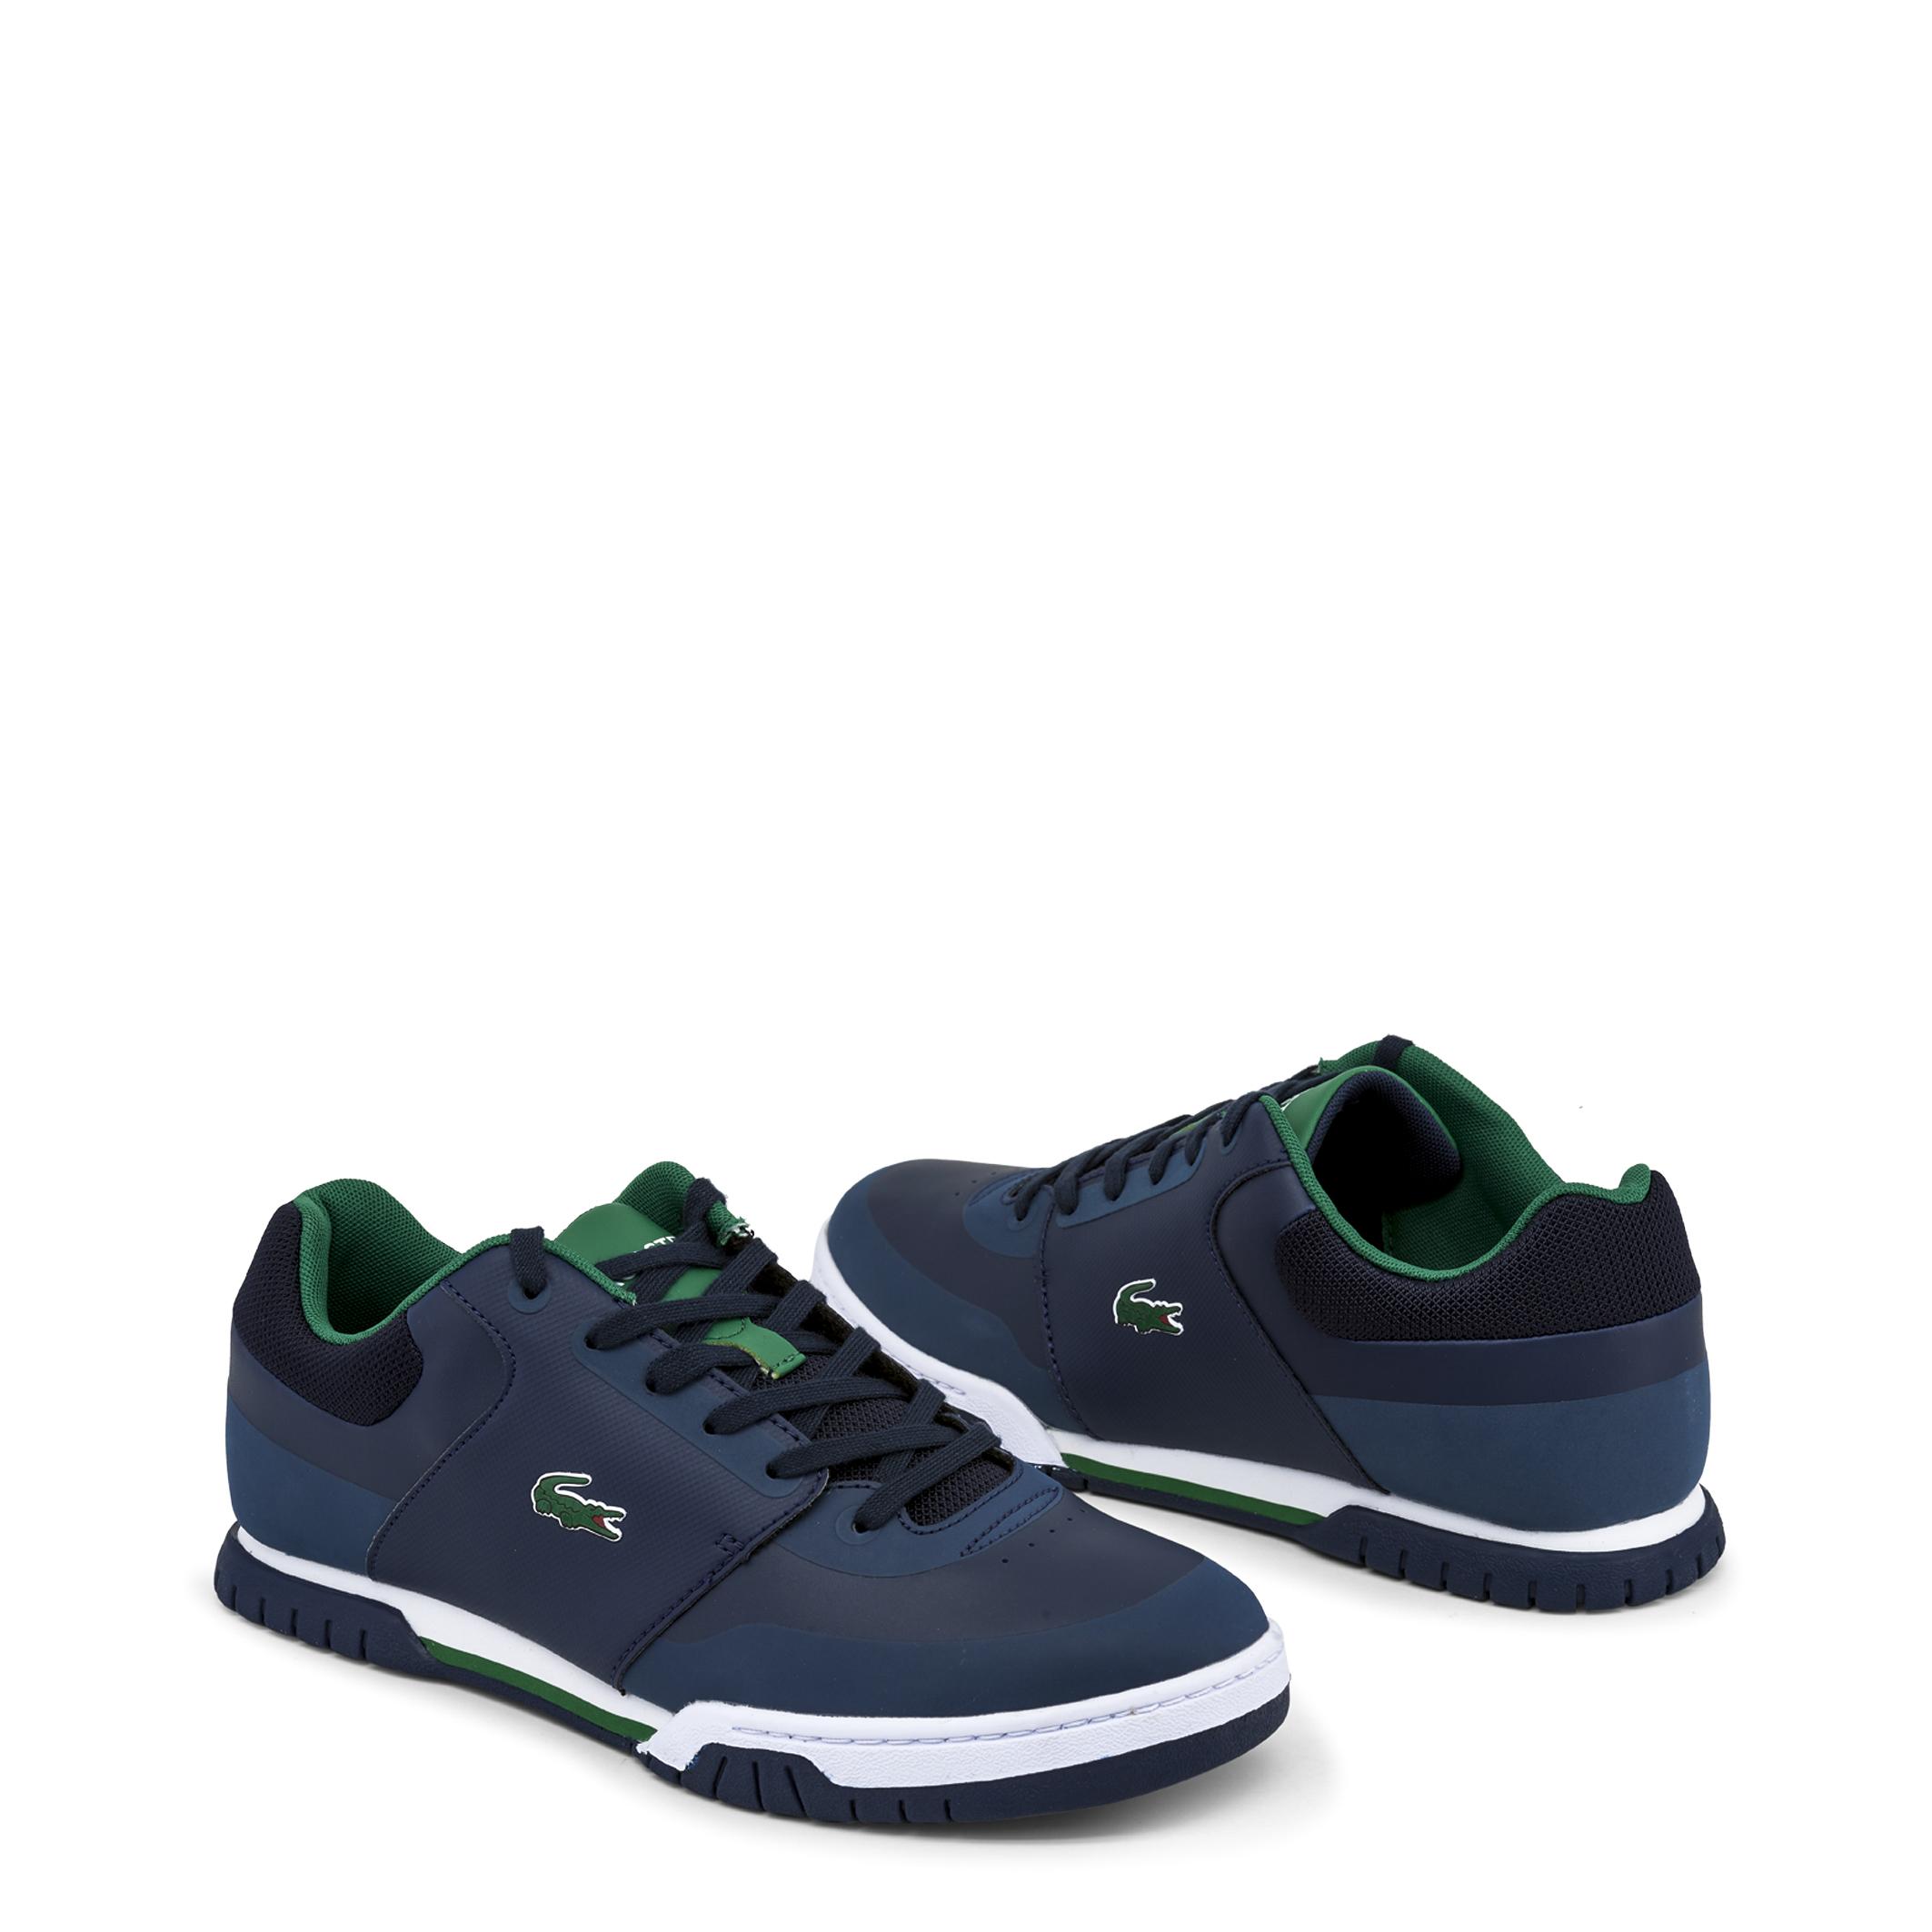 indiana Lacoste 734spm0014 Grn nvy Evo Sneakers 5URxrU